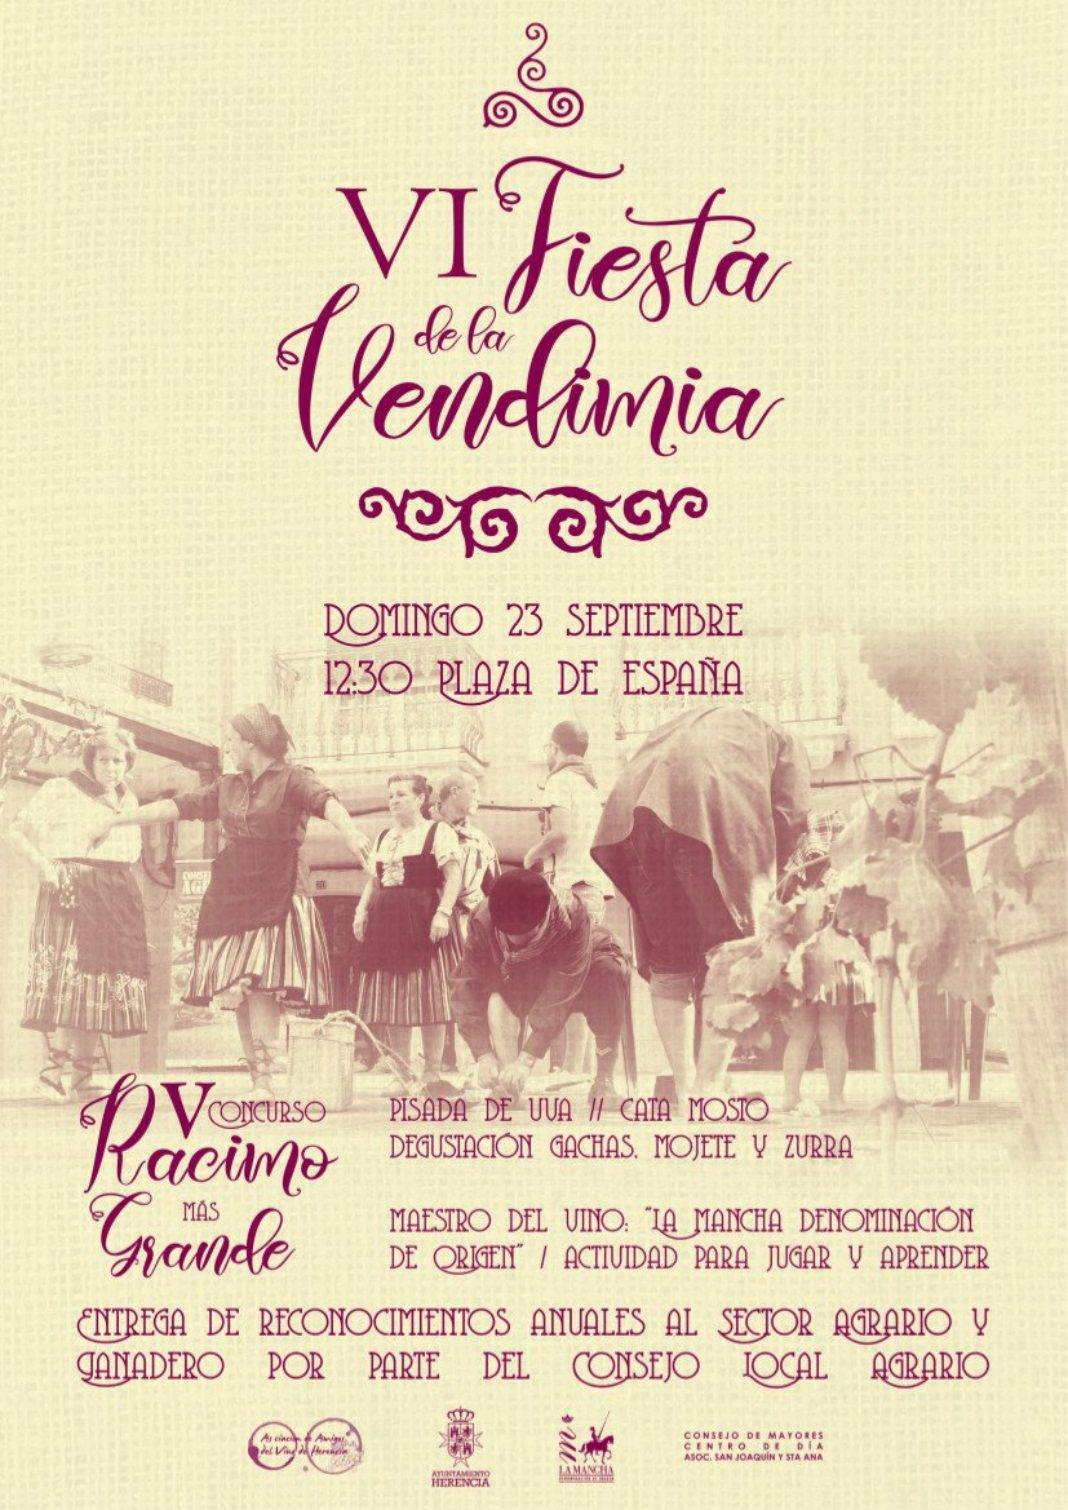 fiesta de la vendimia 2018 herencia 1068x1510 - VI Fiesta de la Vendimia vuelve en la Feria y Fiestas de Herencia